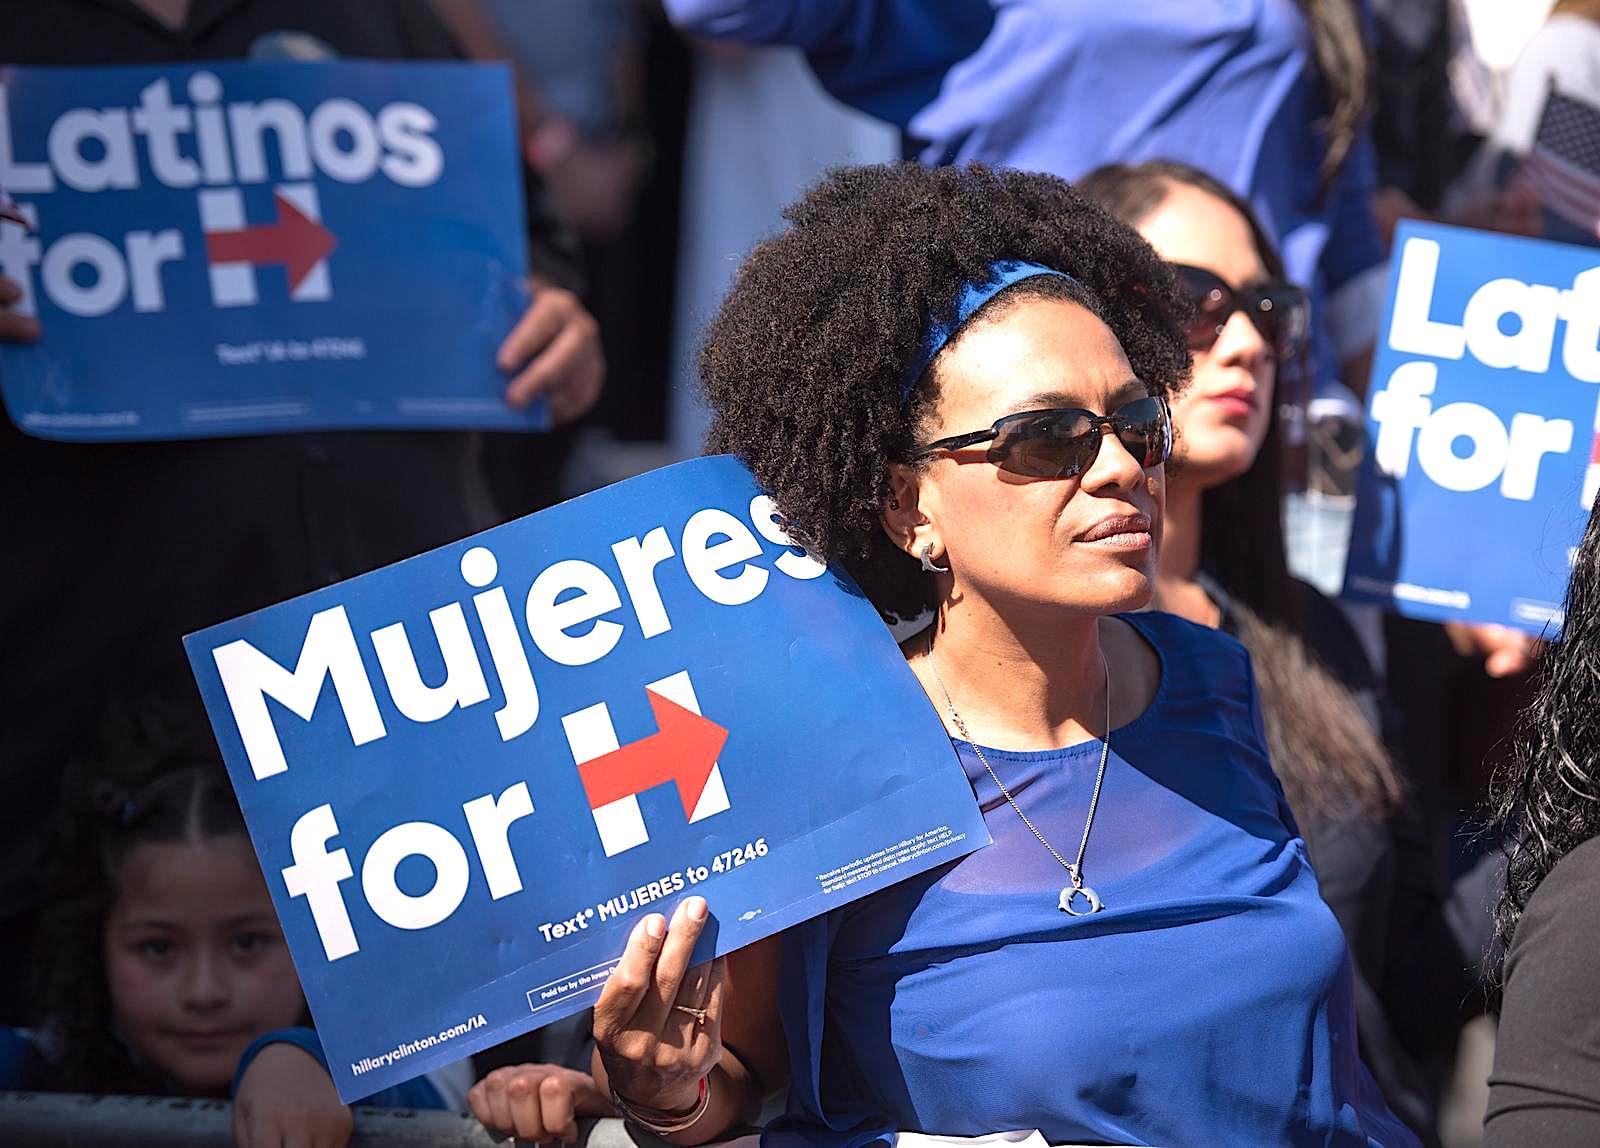 Hillary Clinton, Donald Trump, Democratic National Committee, DNC, 2016 Presidential Election, Liberals, Conservative, Racial Politics, Identity Politics, KOLUMN Magazine, KOLUMN